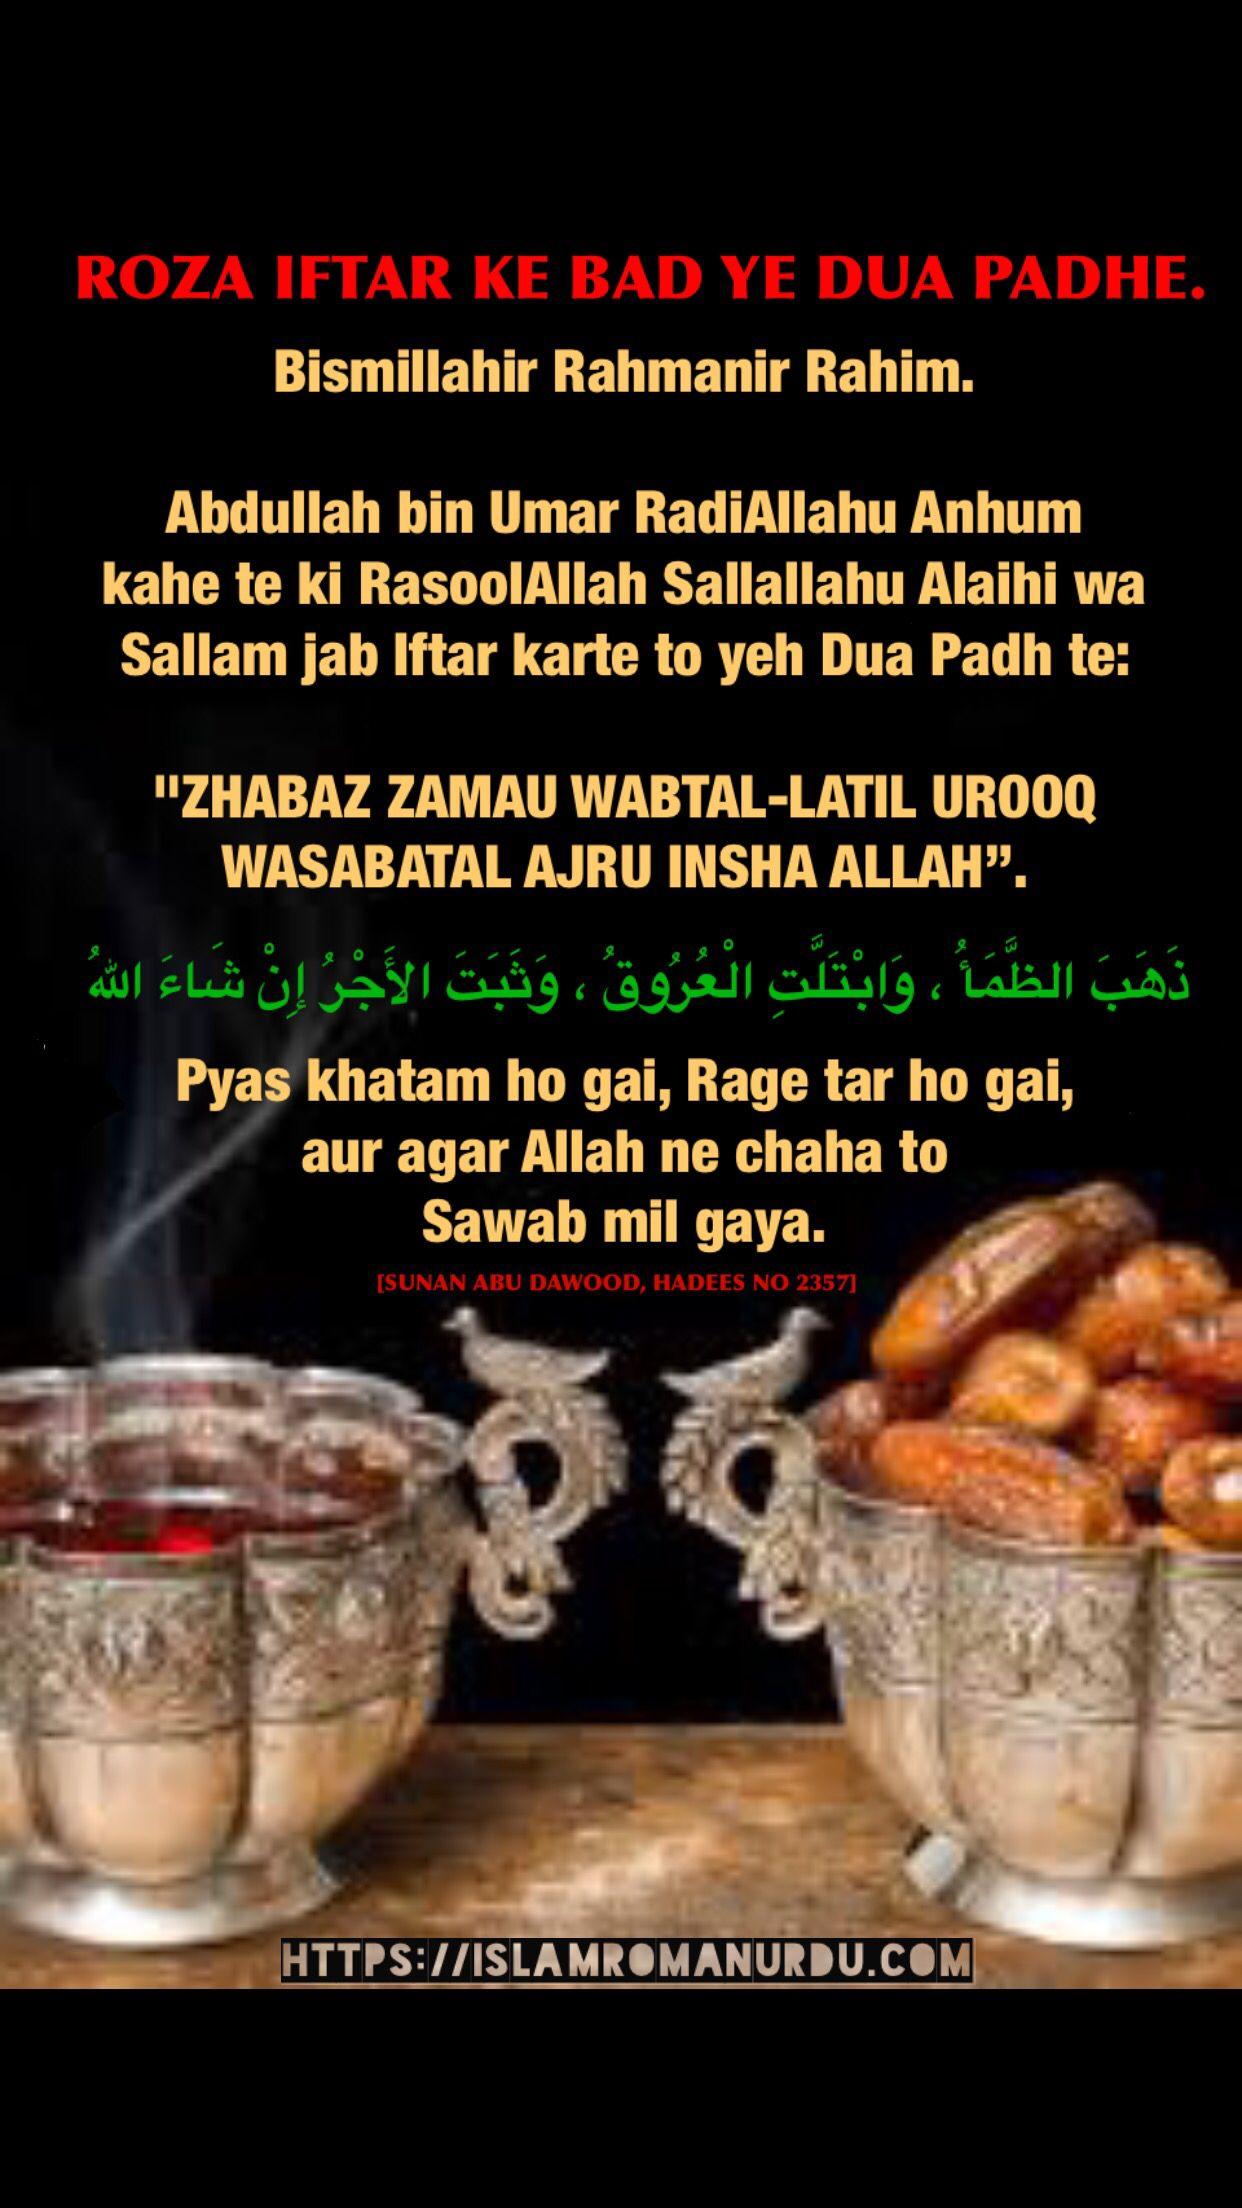 ROZA IFTAR KE BAD YE DUA PADHE  Abdullah bin Umar RadiAllahu